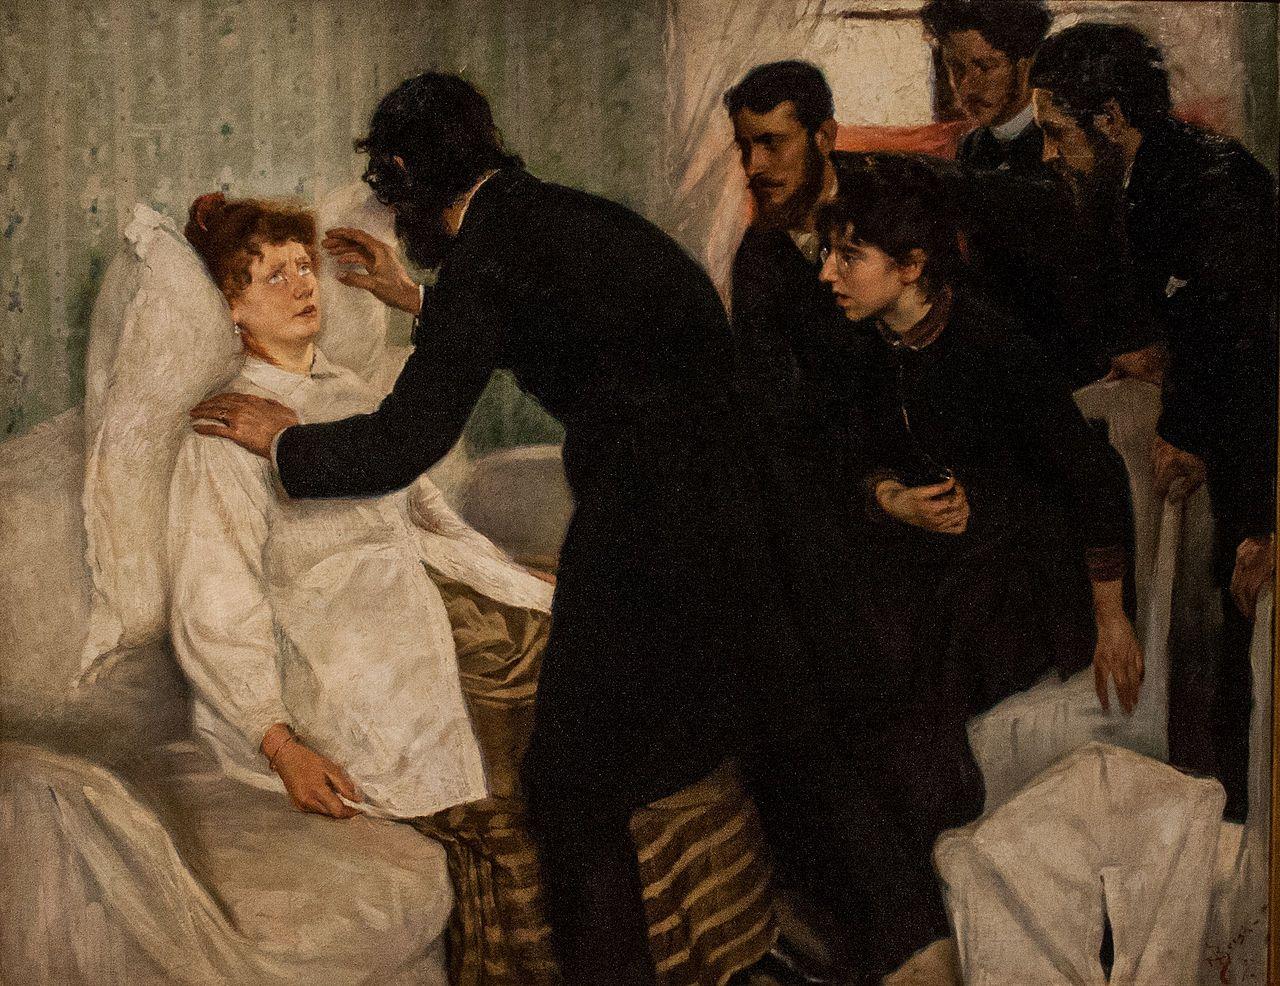 Seance d'hypnose, peinte par Richard Bergh (1858-1919).